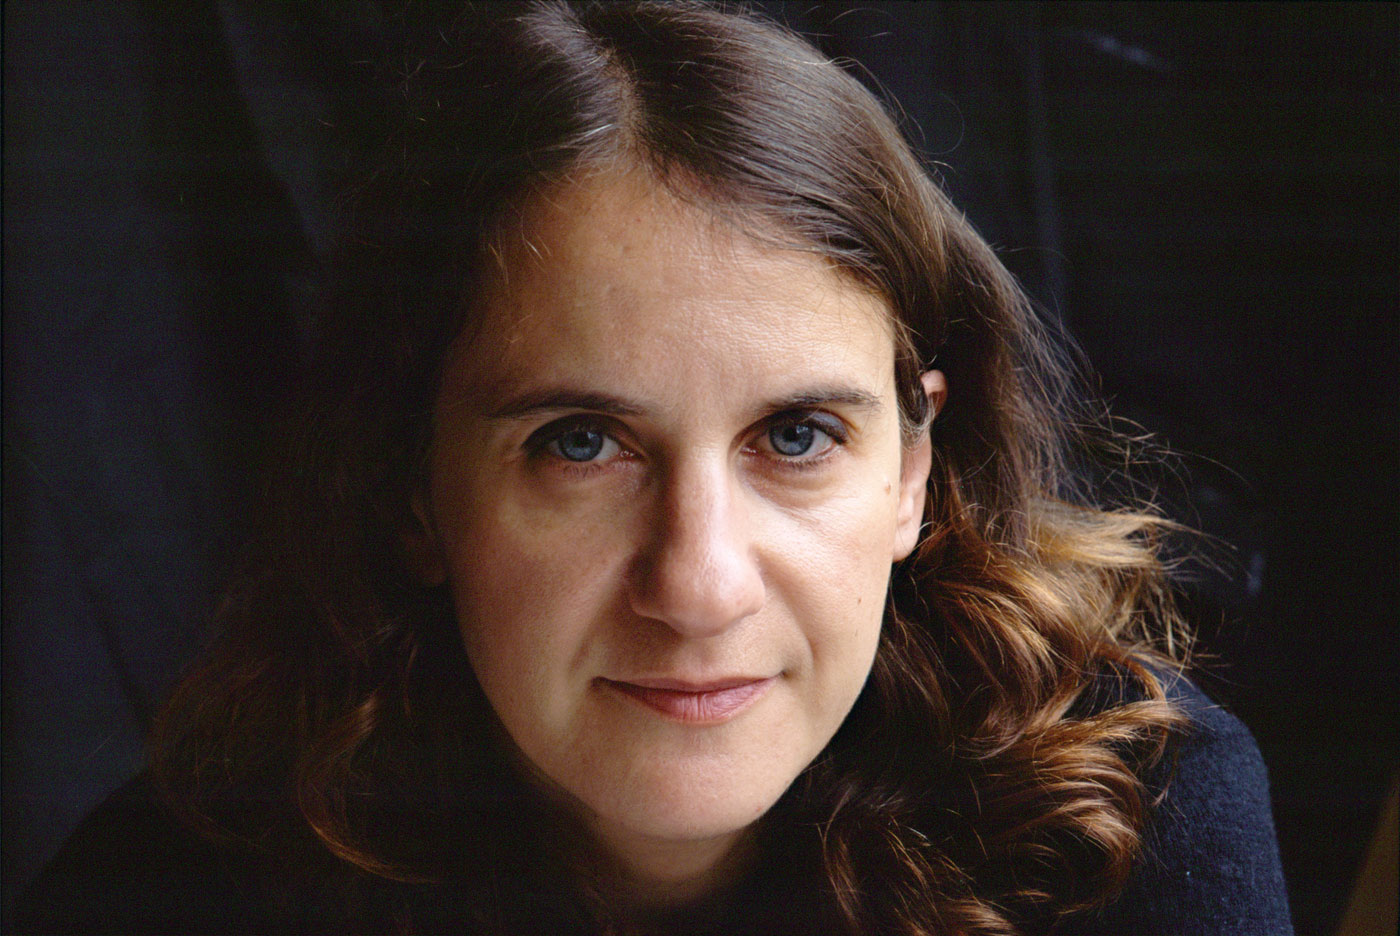 Portrait de Corinne Maier © Ewa Rudlin